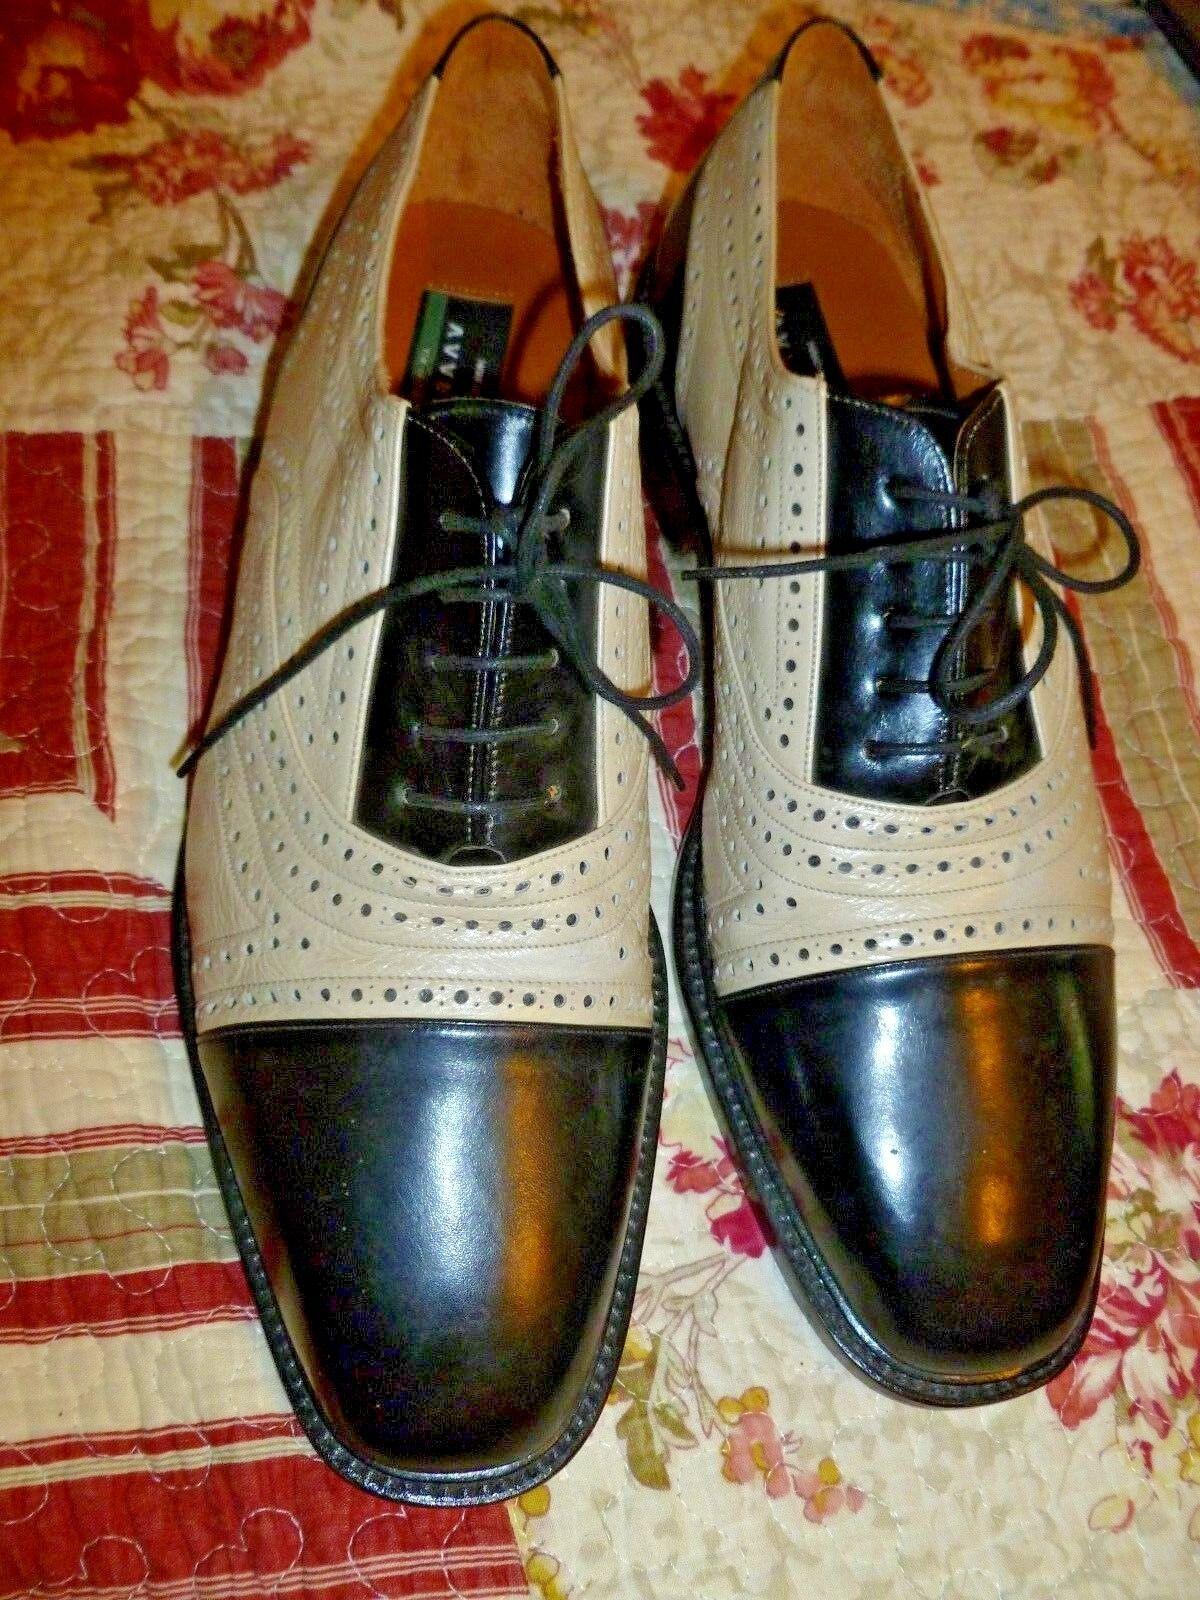 Uomo Avventura 2 tone Leather Cap Toe Oxford Shoes. Size 12